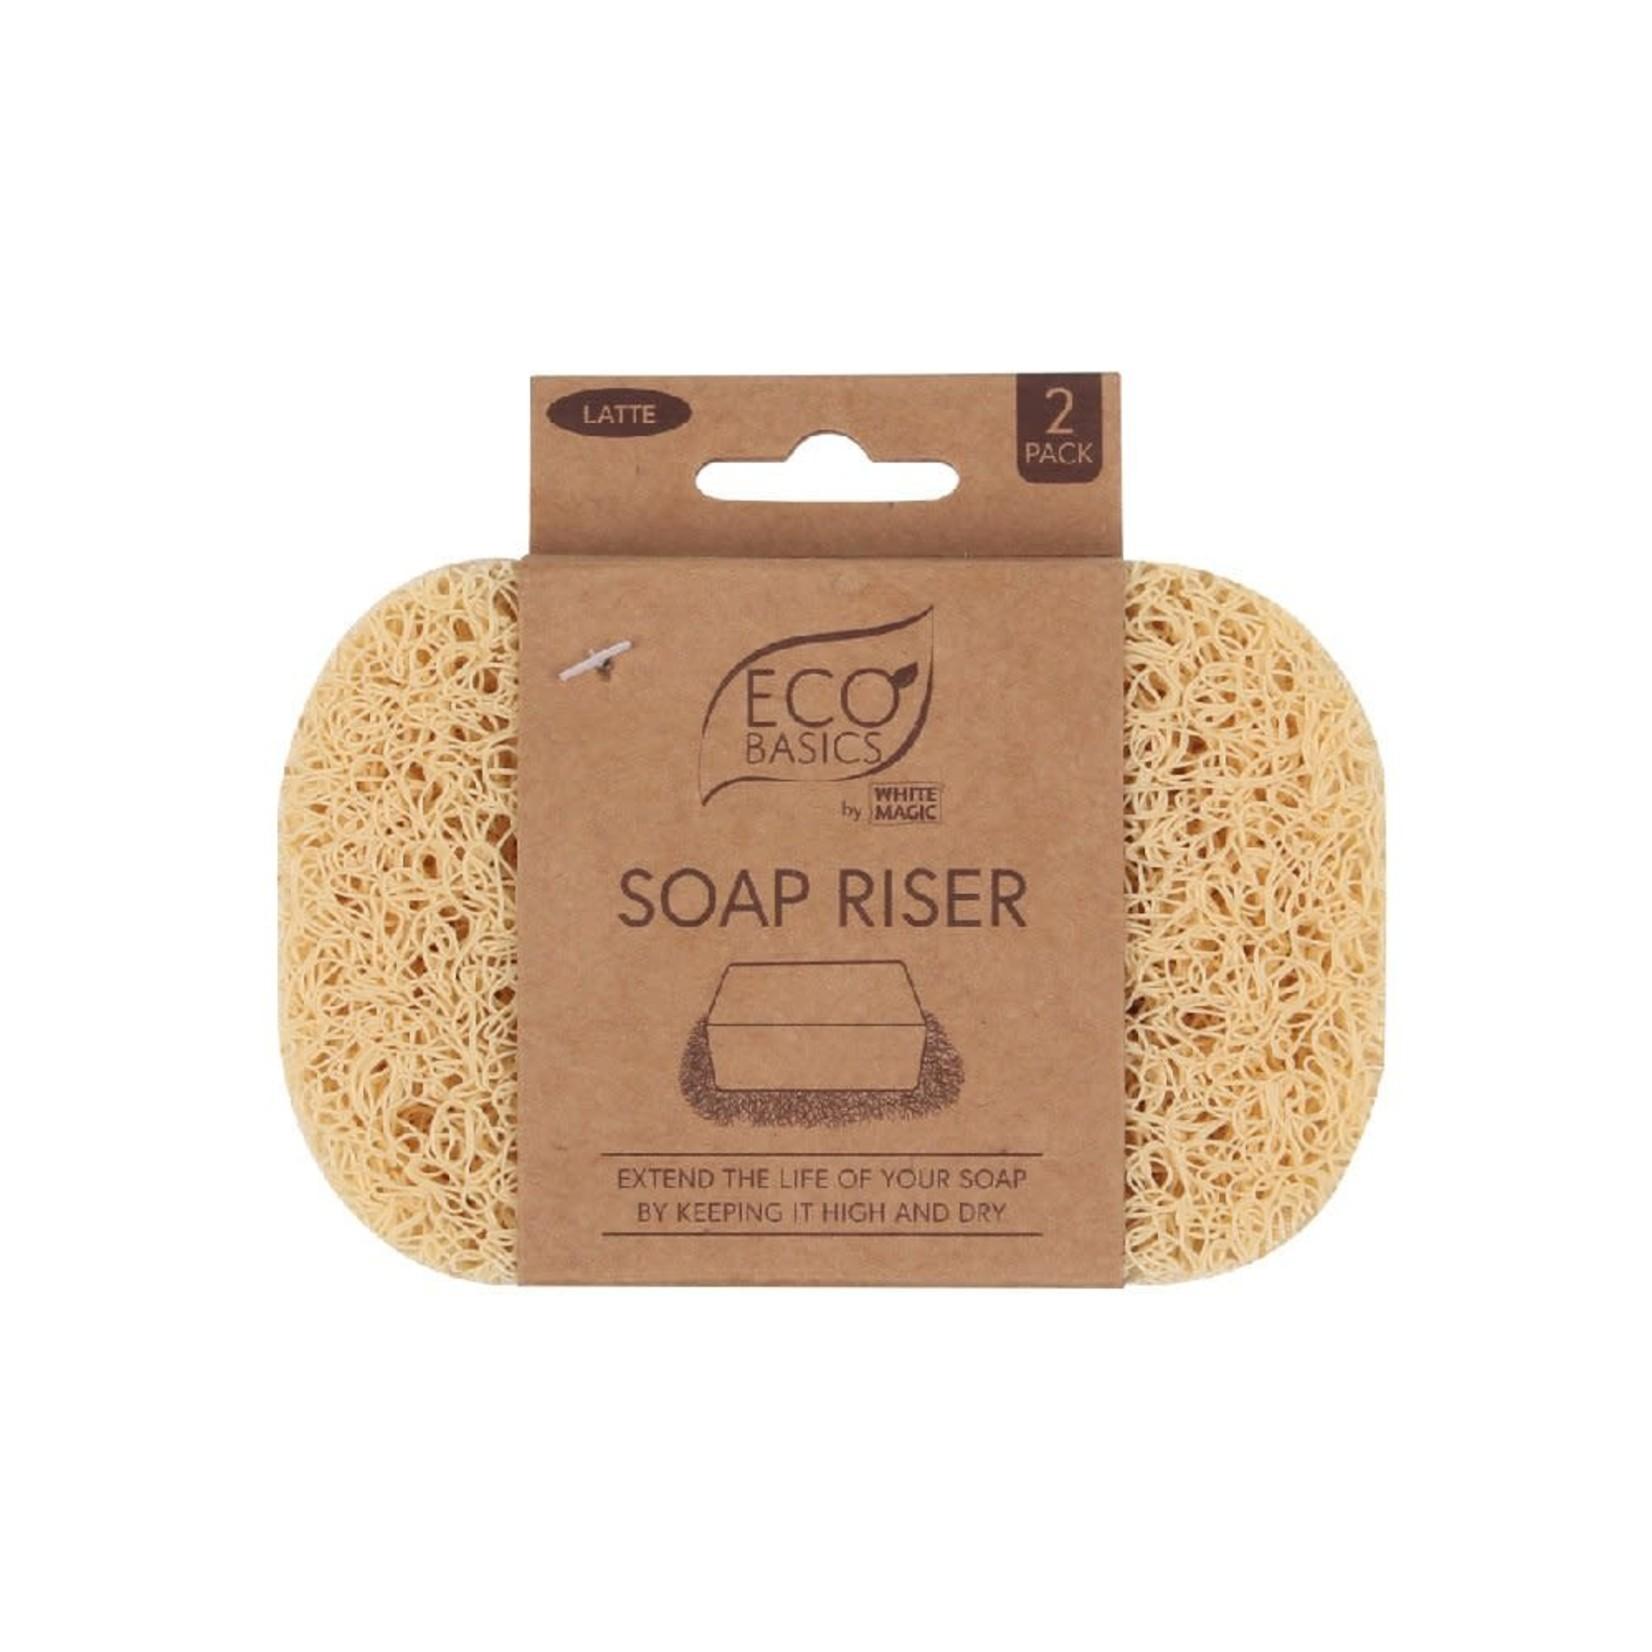 Eco Basics Eco Basics Soap Riser 2pk